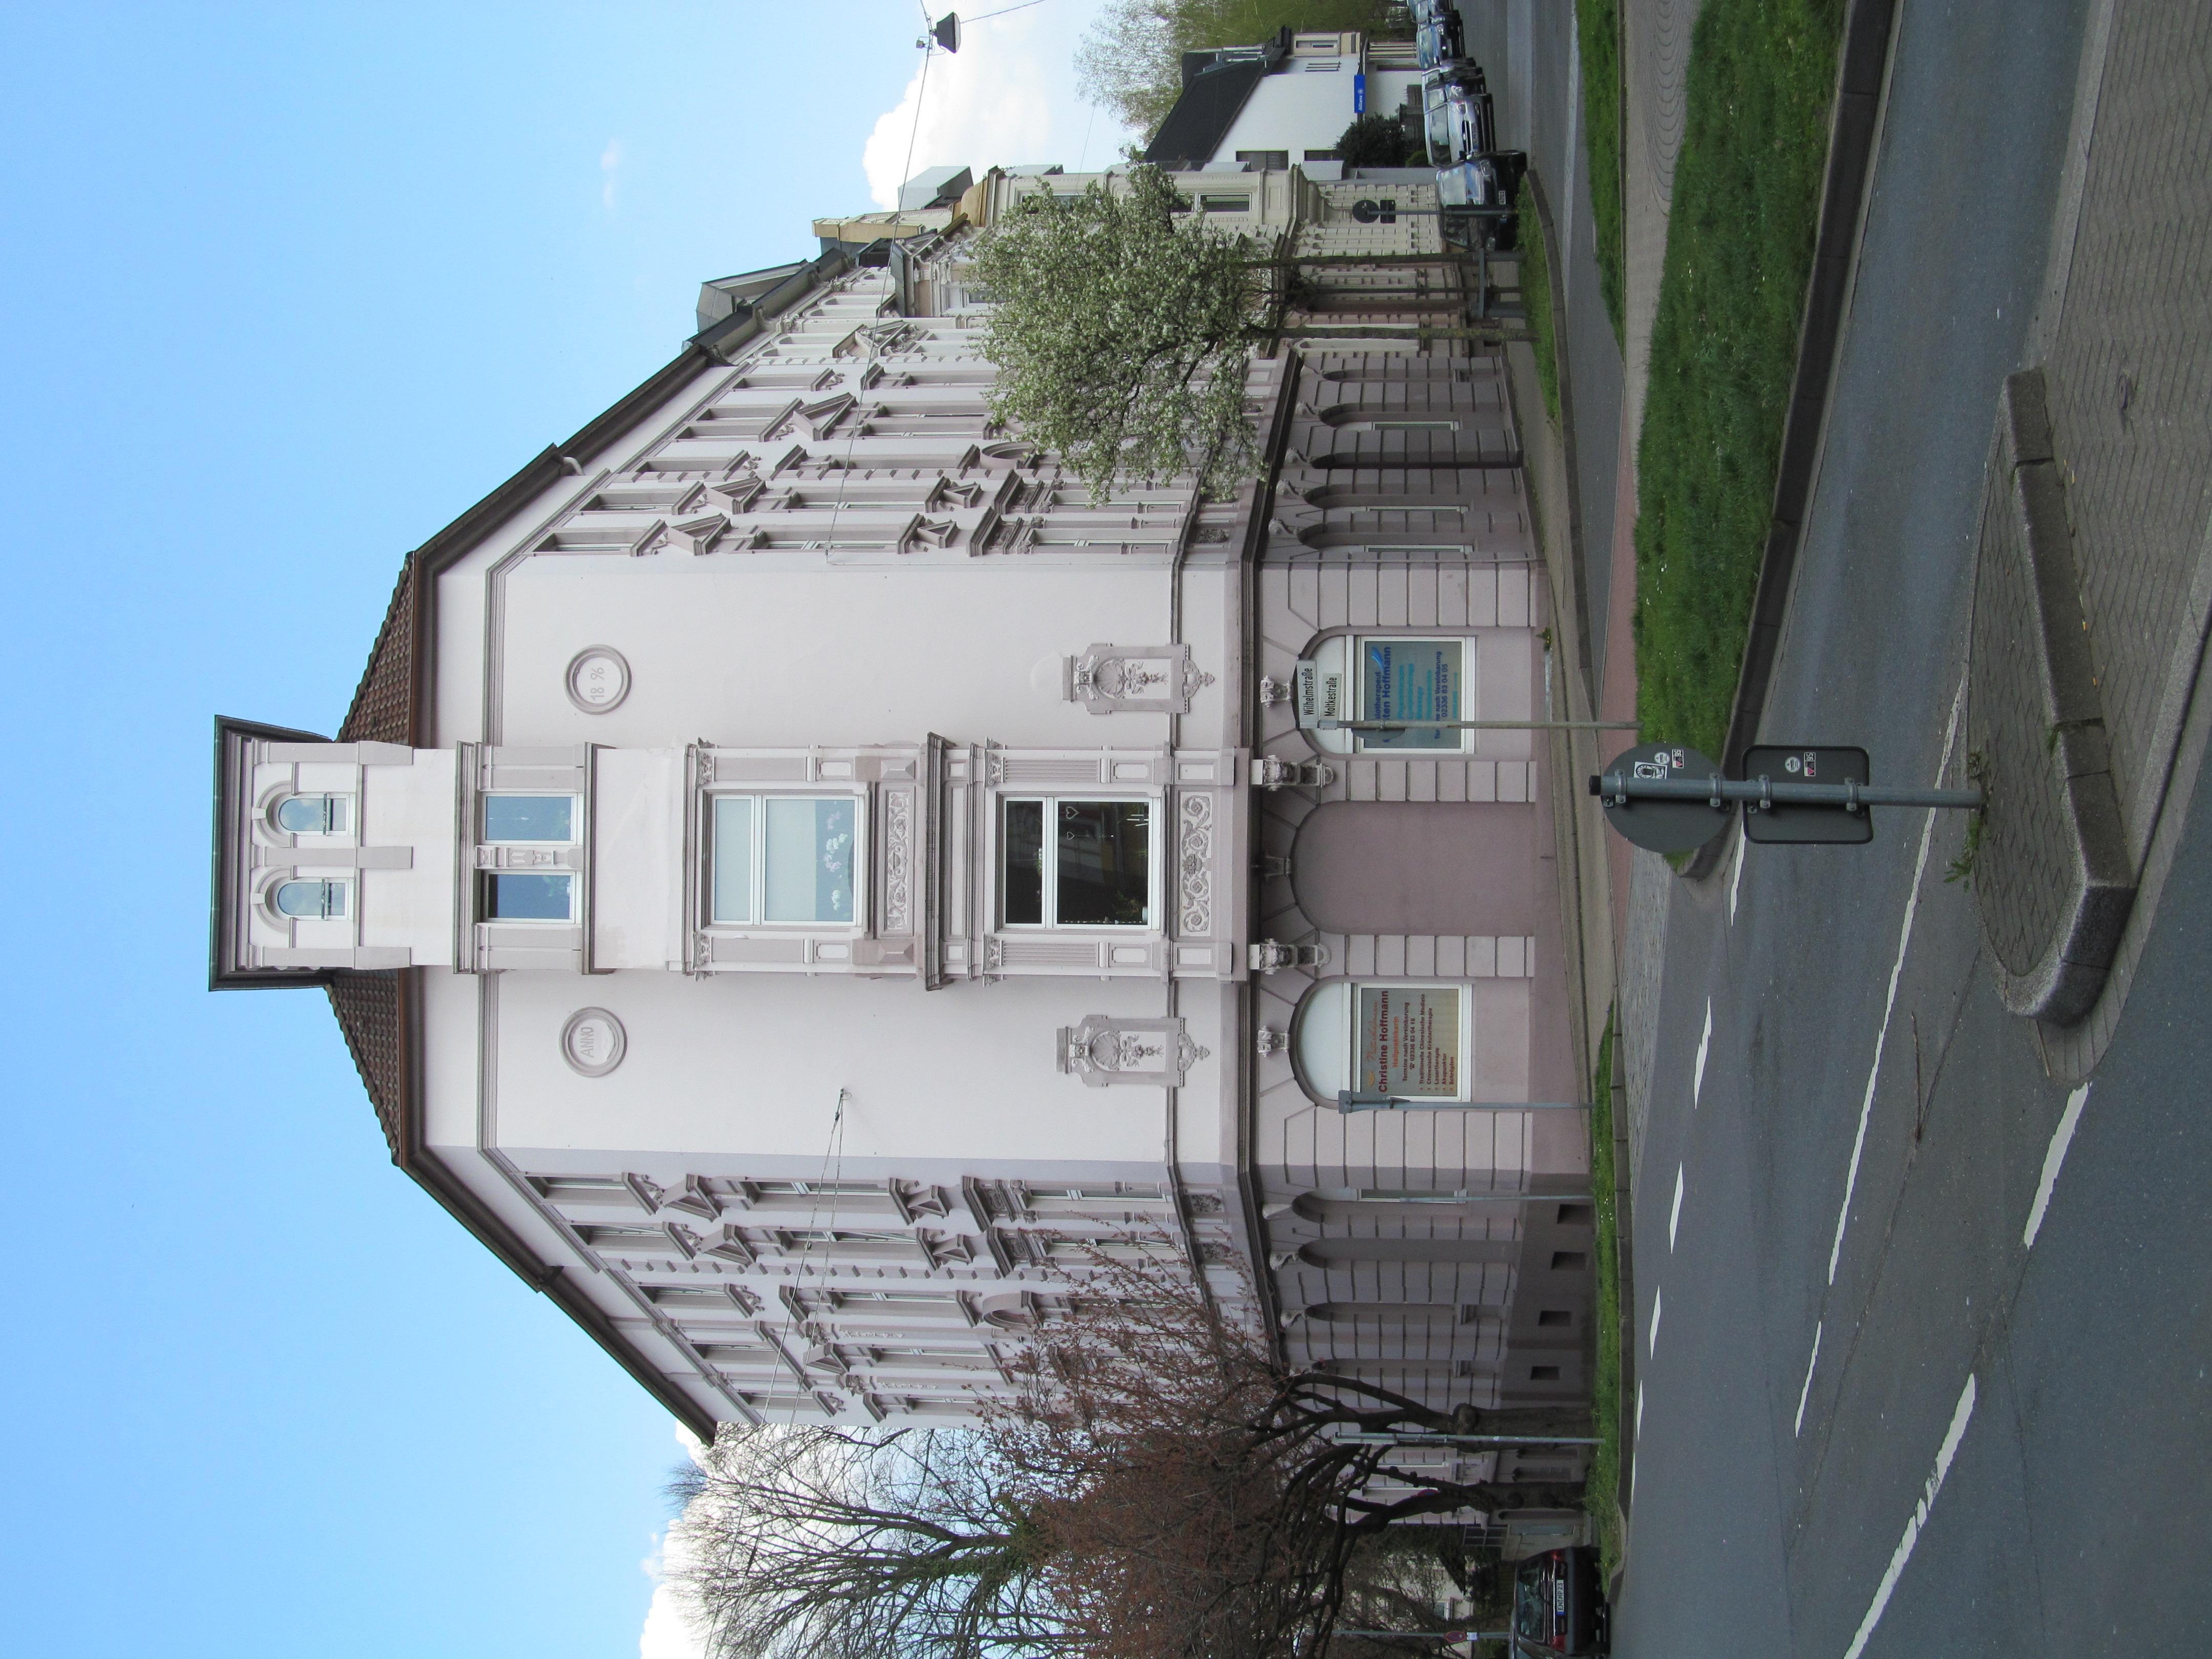 Moltkestraße